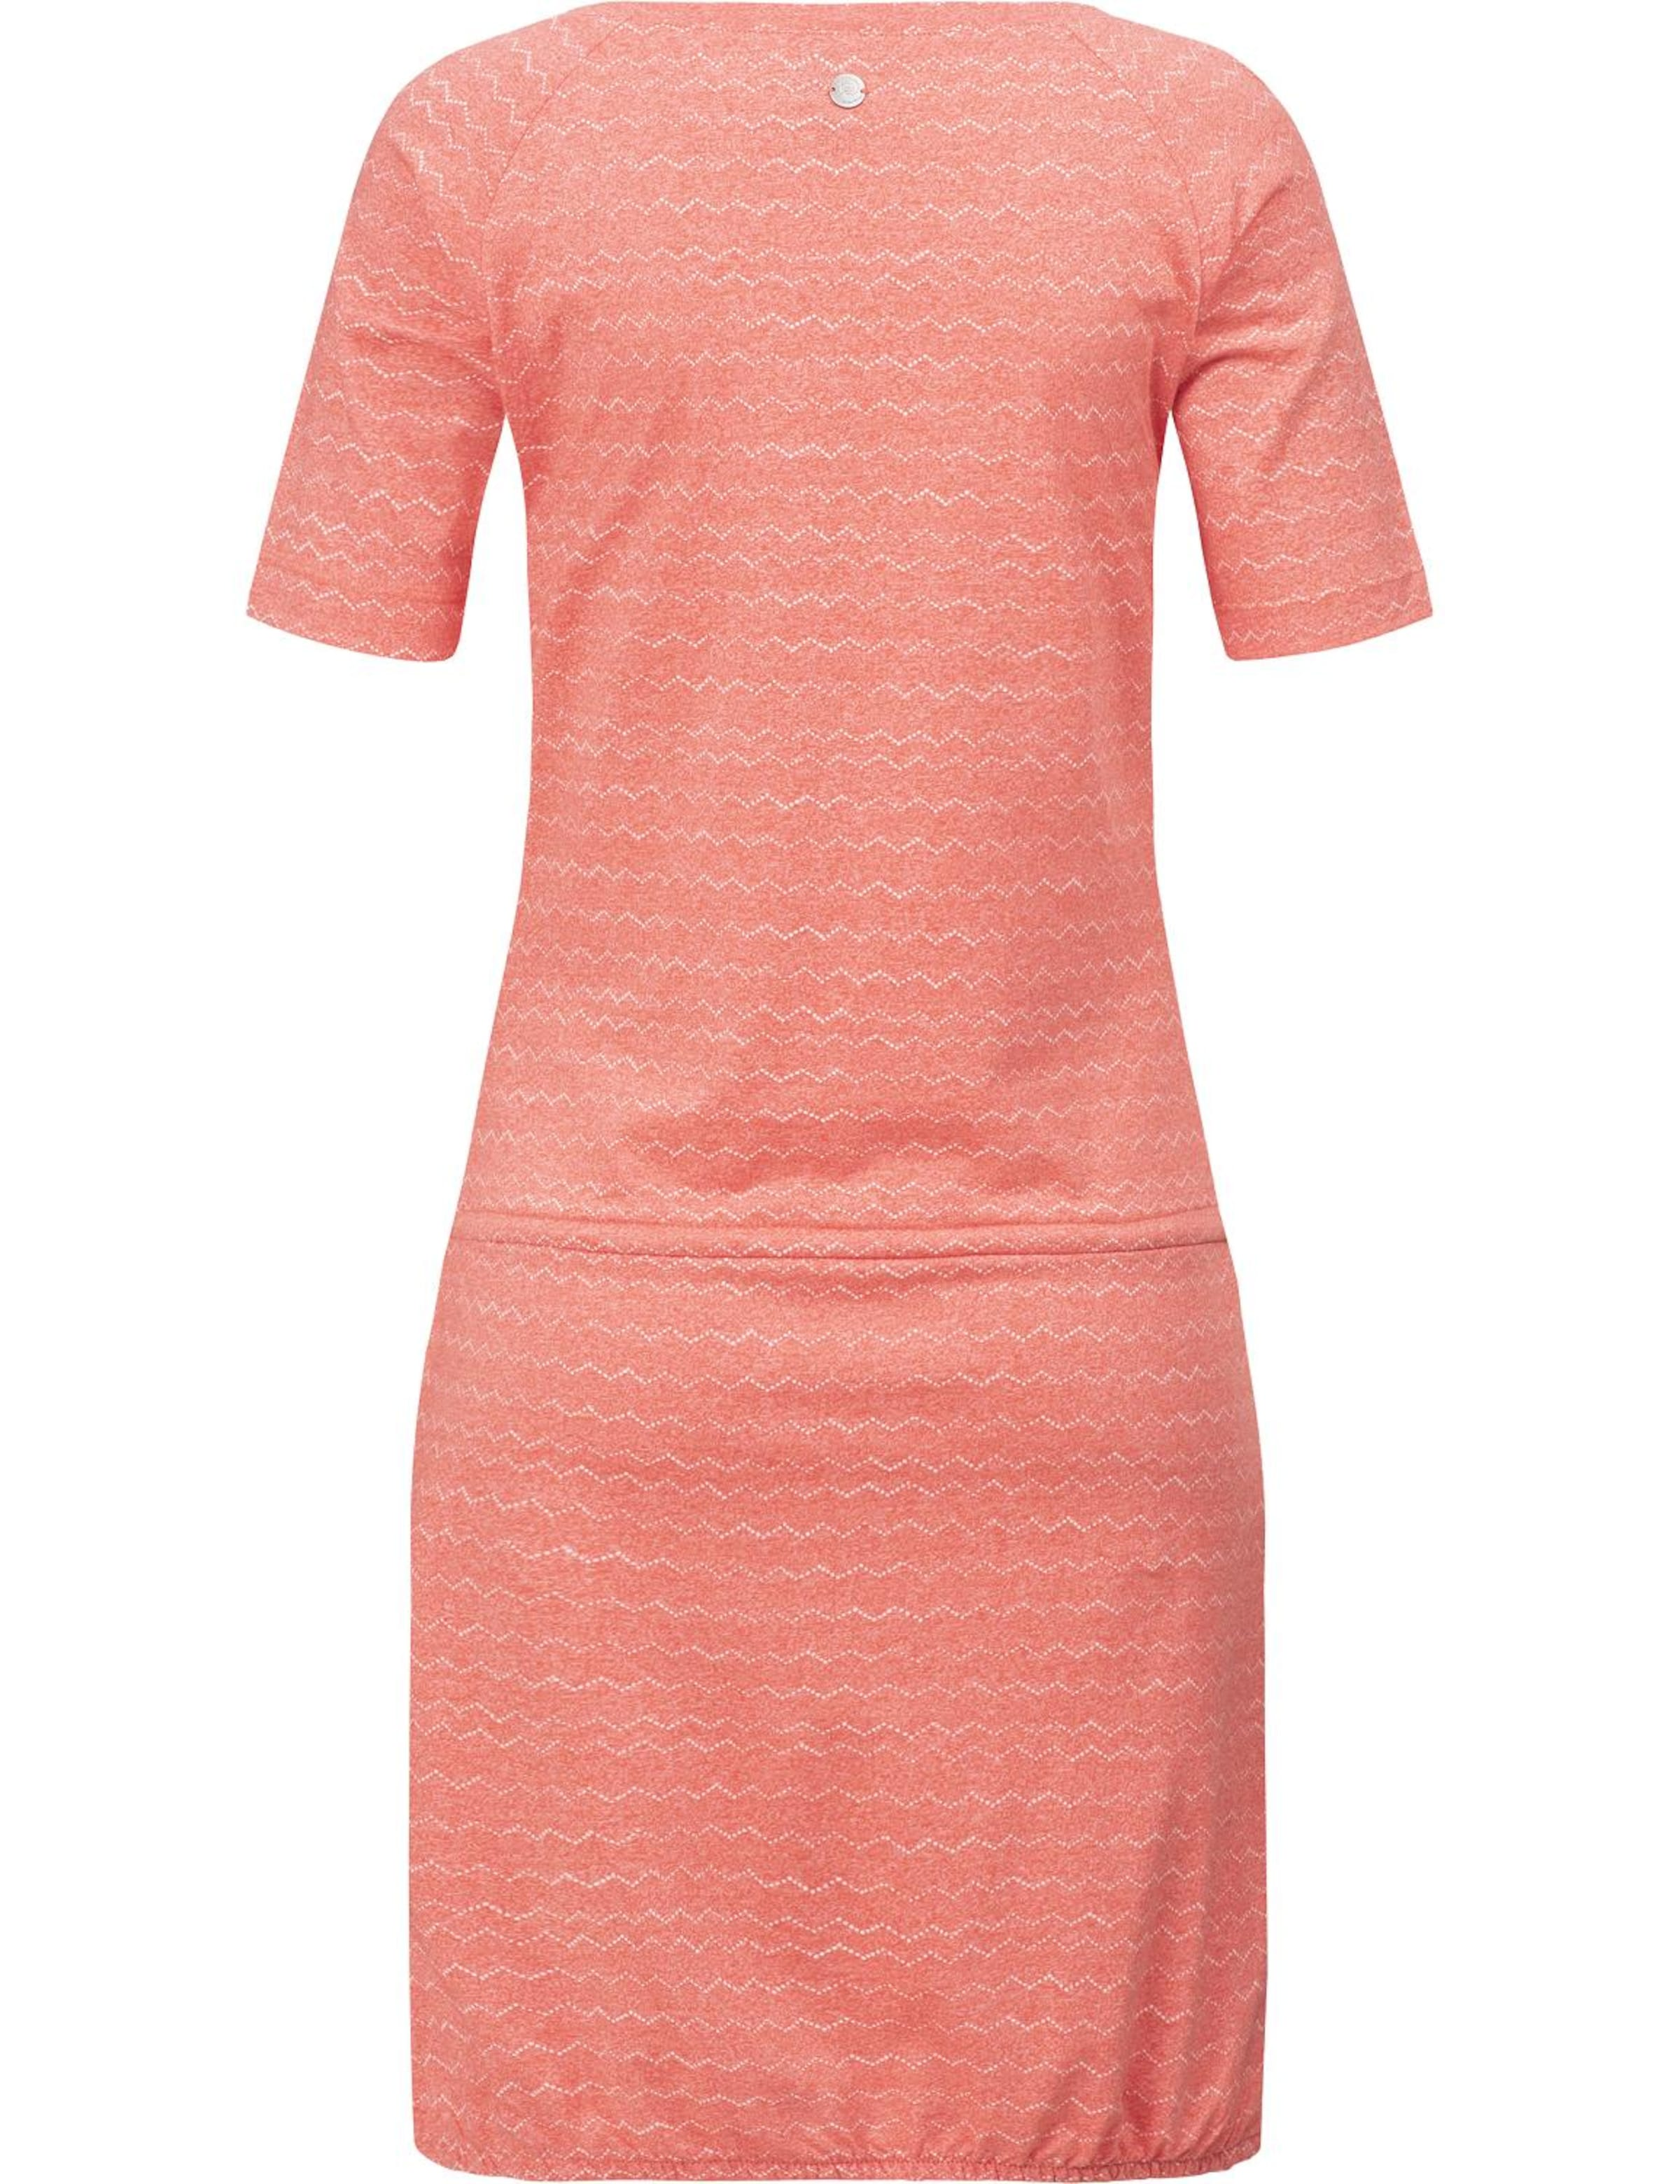 LachsWeiß Ragwear 'veseta Organic' Kleid In zVSpMGqU